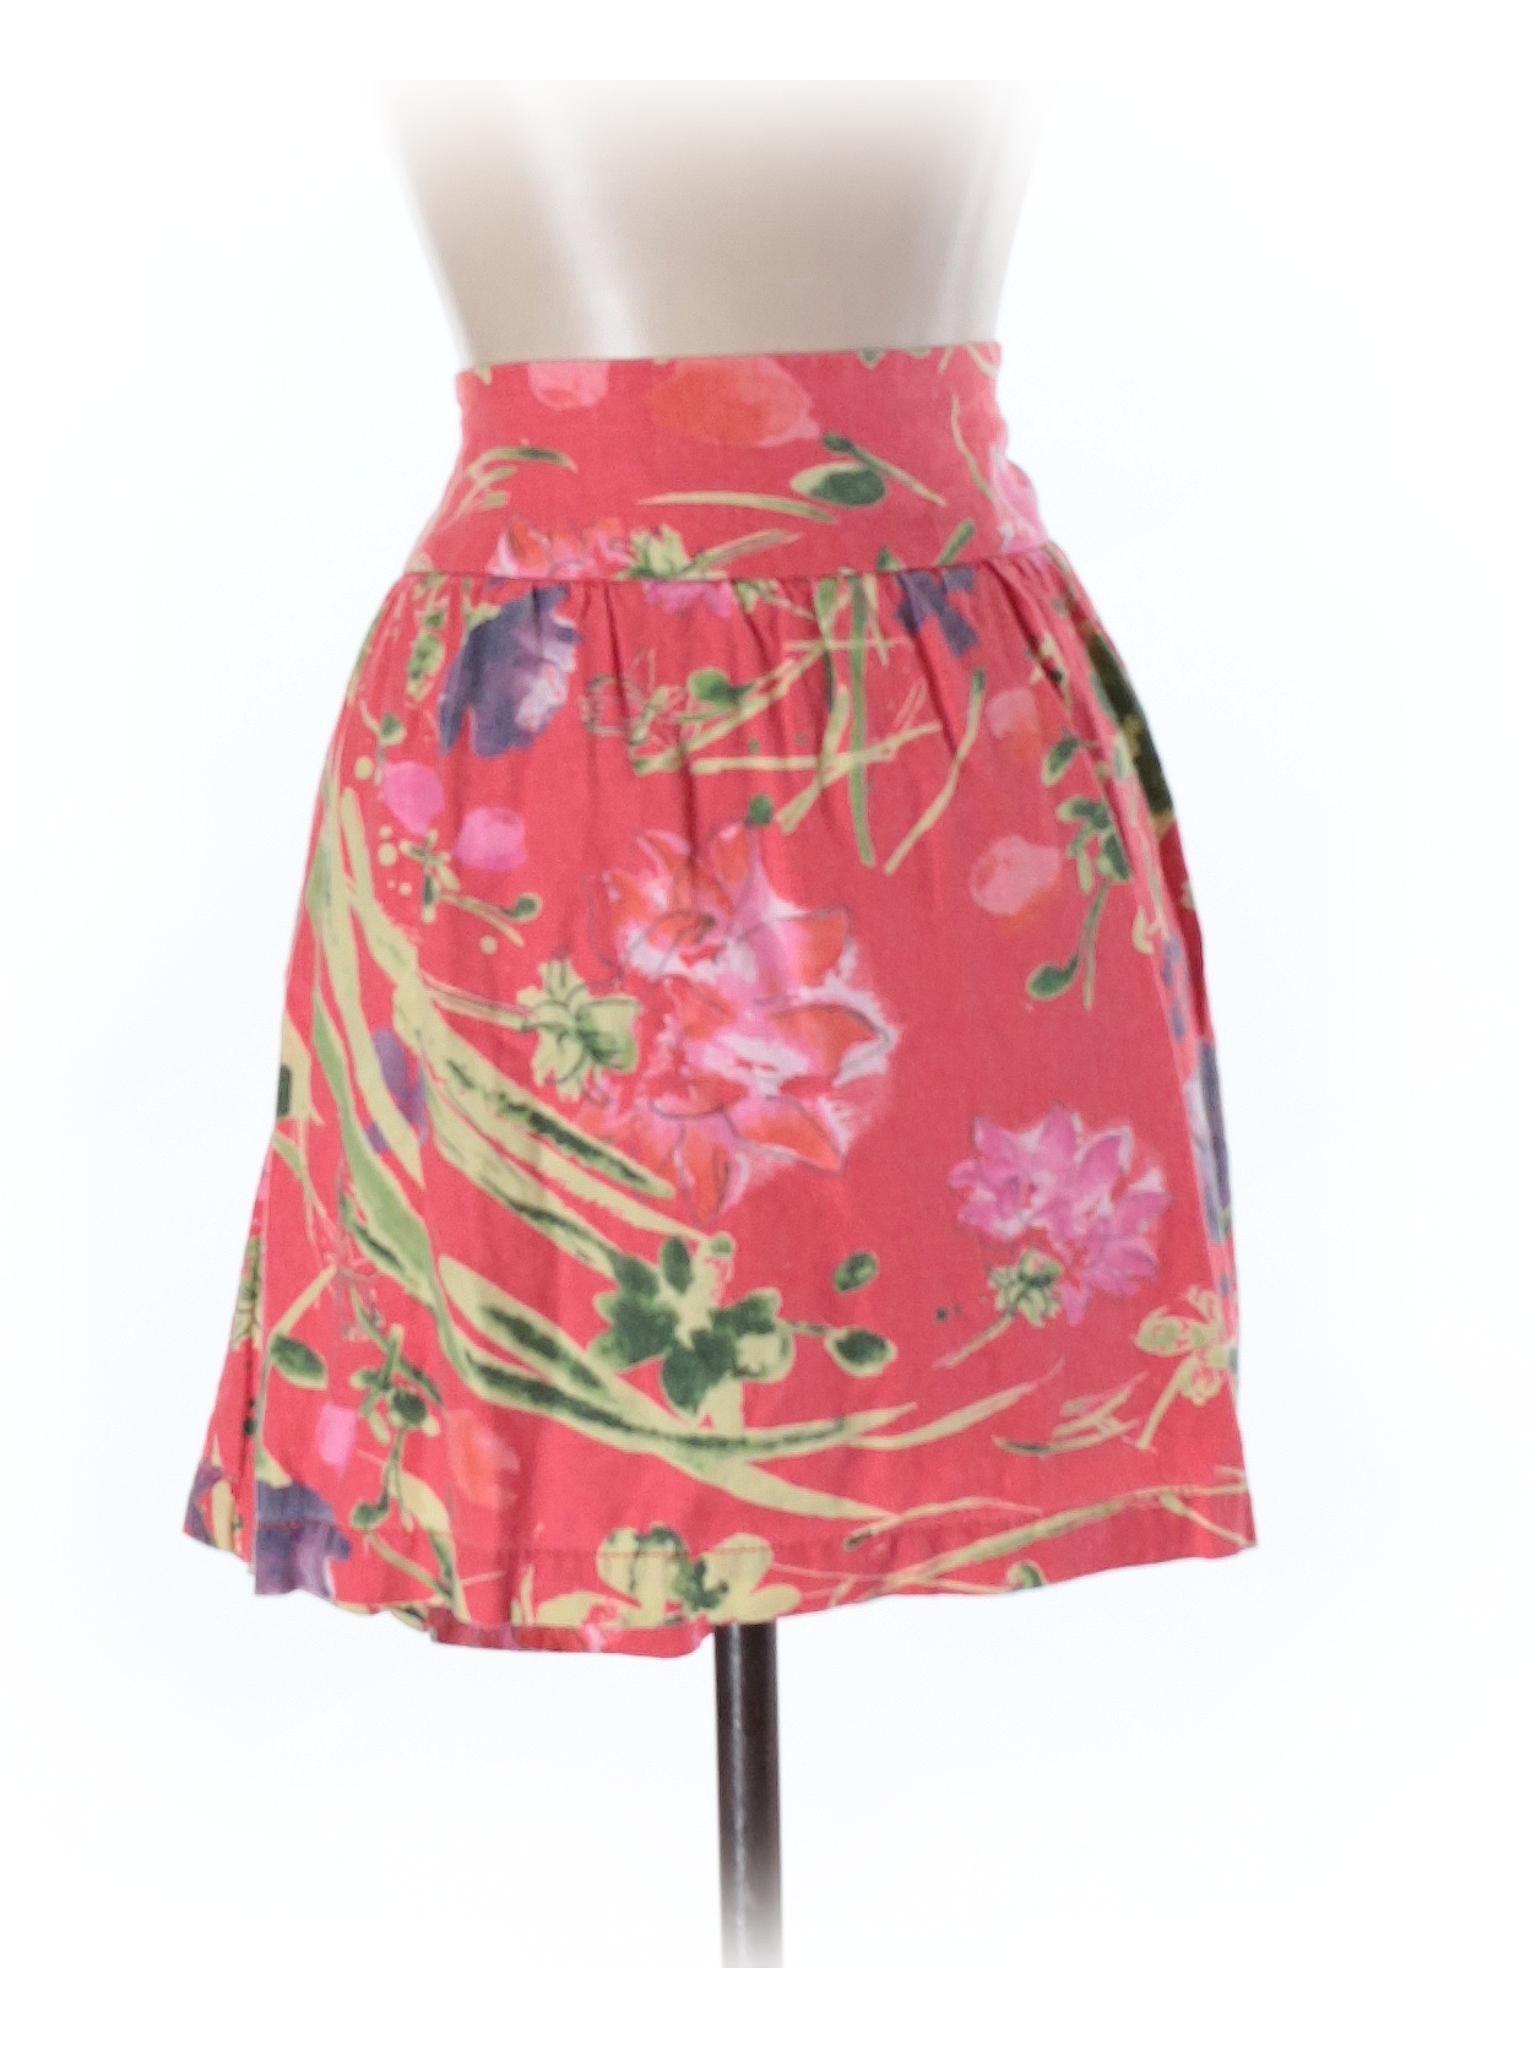 Boutique Casual Casual Casual Skirt Boutique Boutique Skirt xqtwwSXR